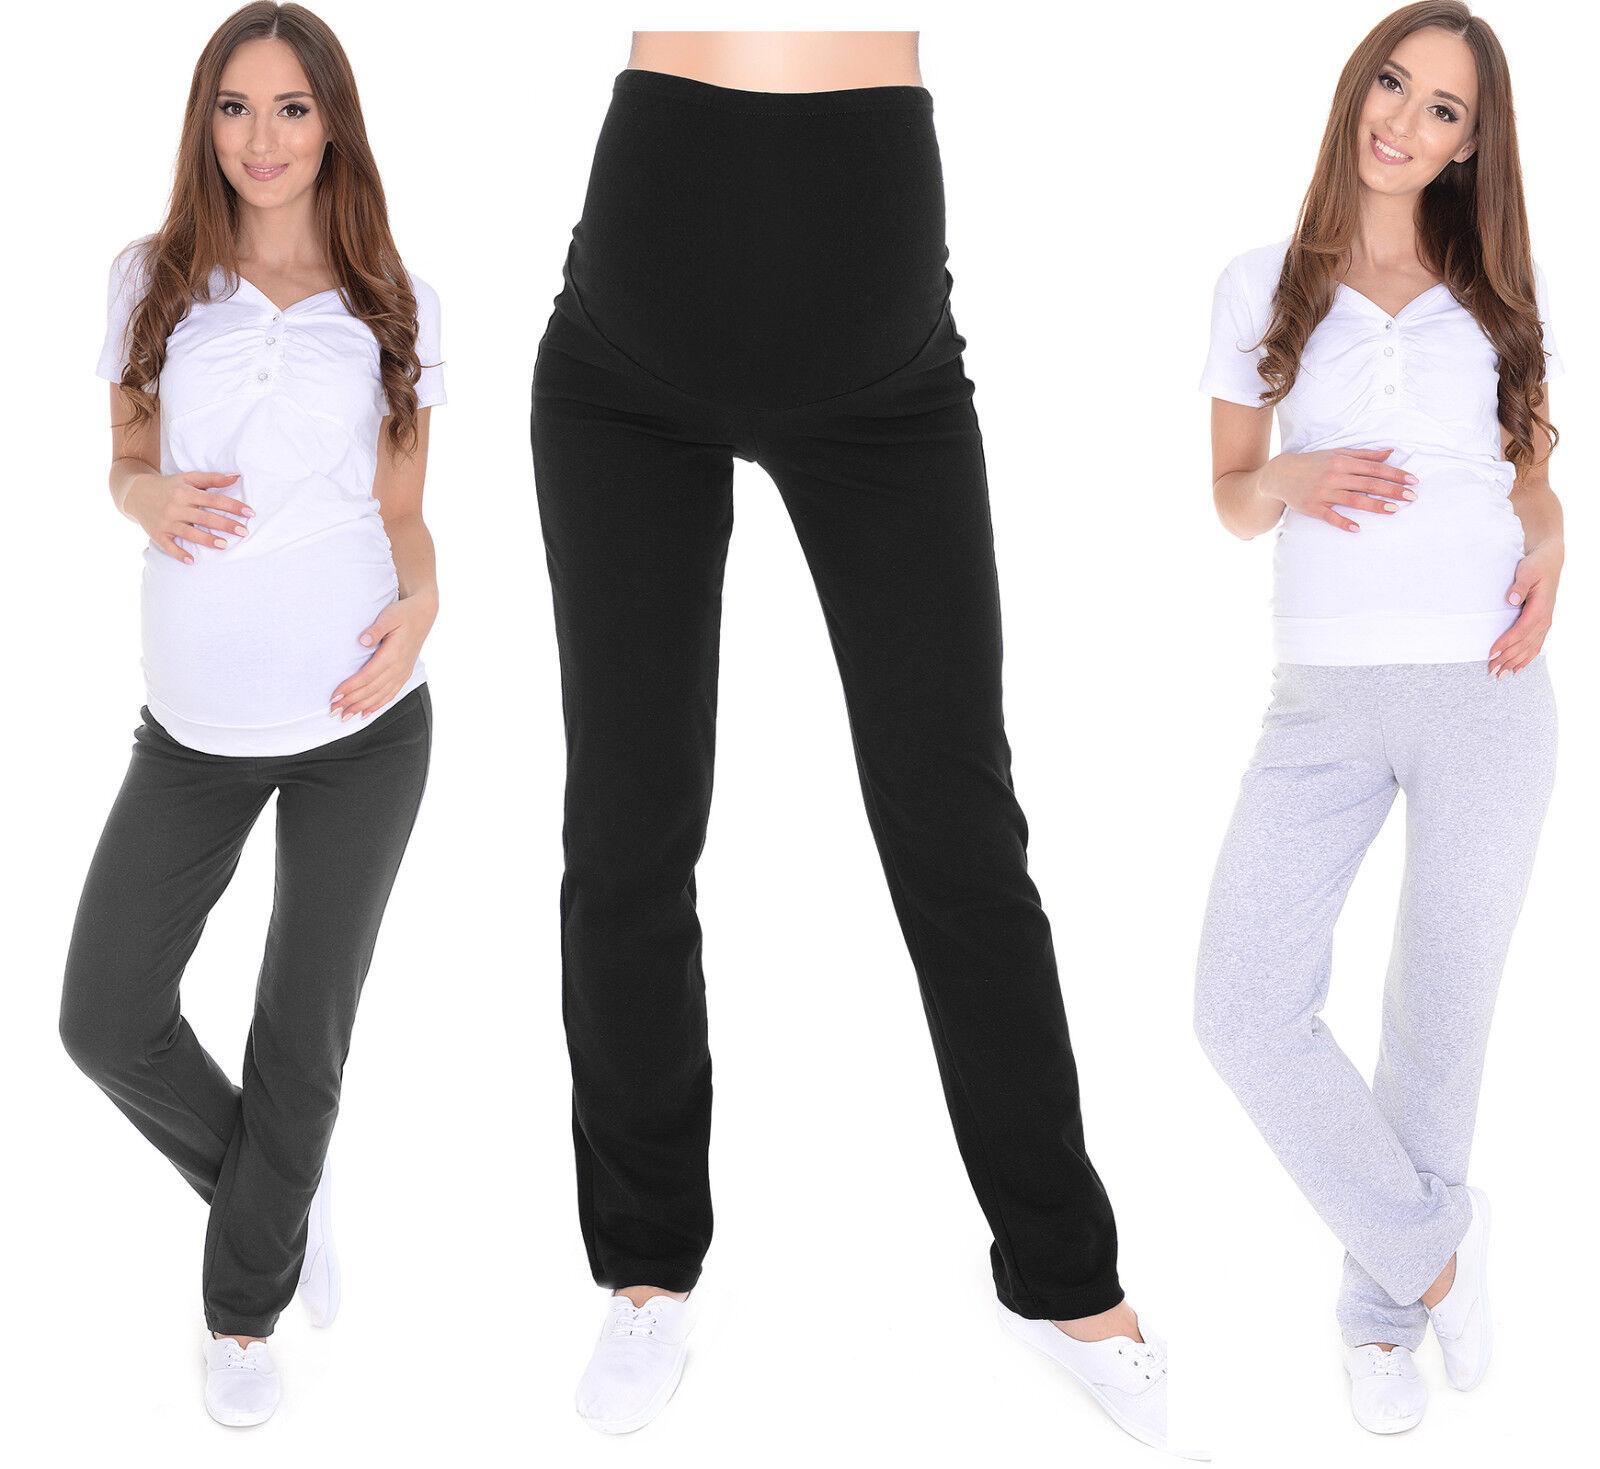 6fda8b5891fae Mija - Maternity Casual Comfortable Yoga Trousers Over Bump 3010 16 Navy  for sale online   eBay